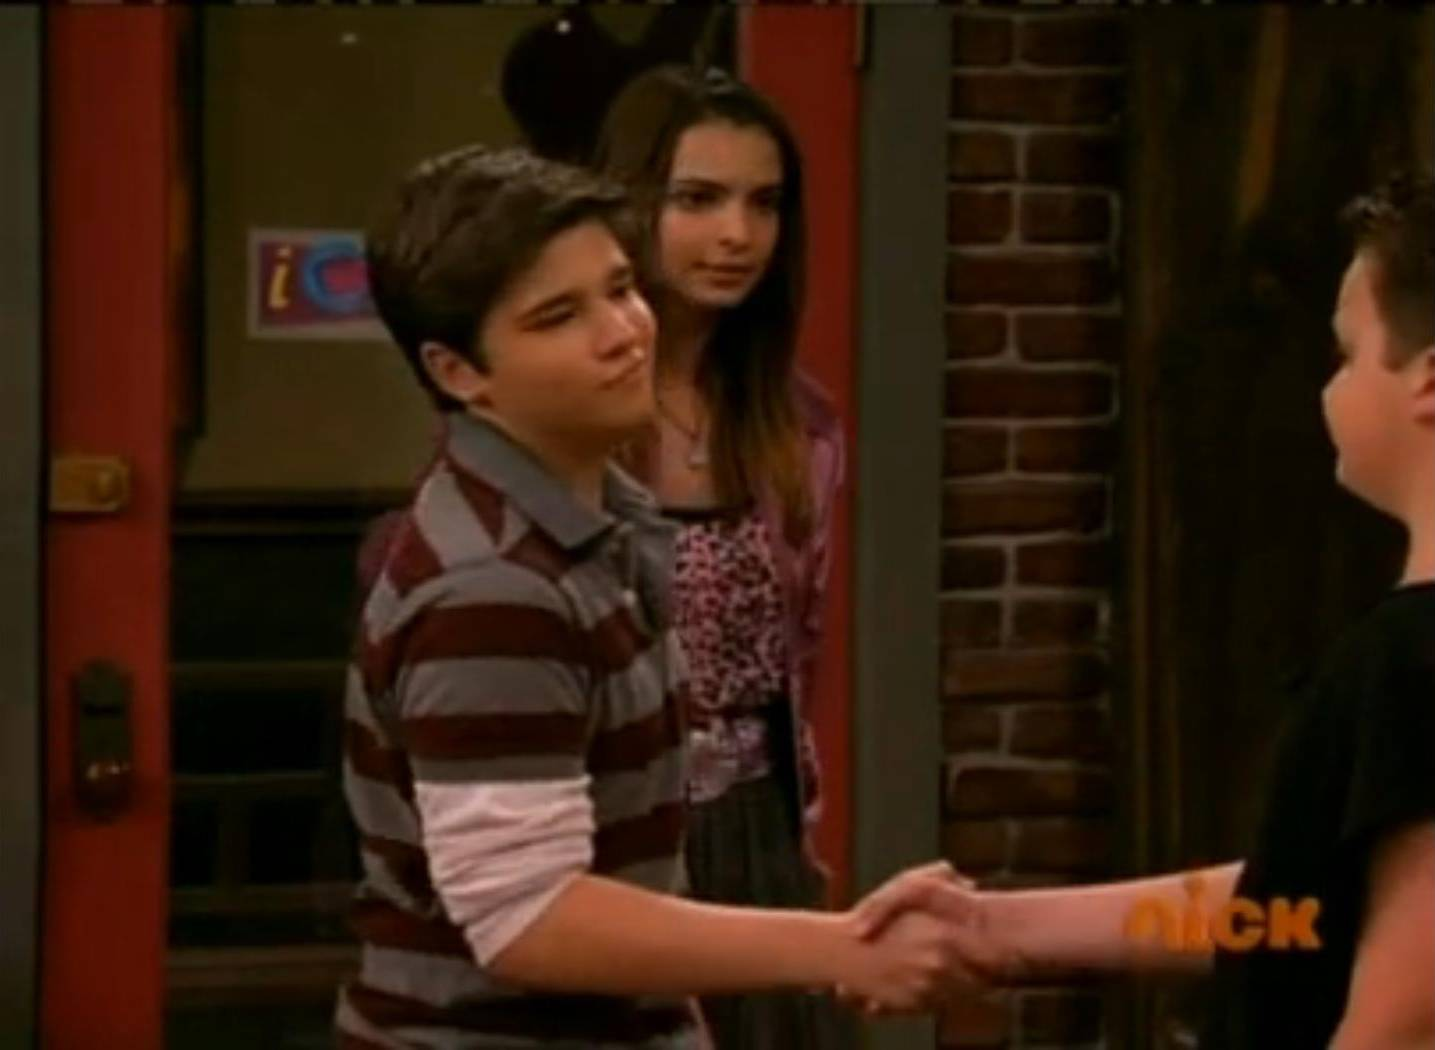 iCarly episoder Sam och Freddie datingBSA motorcykel dating